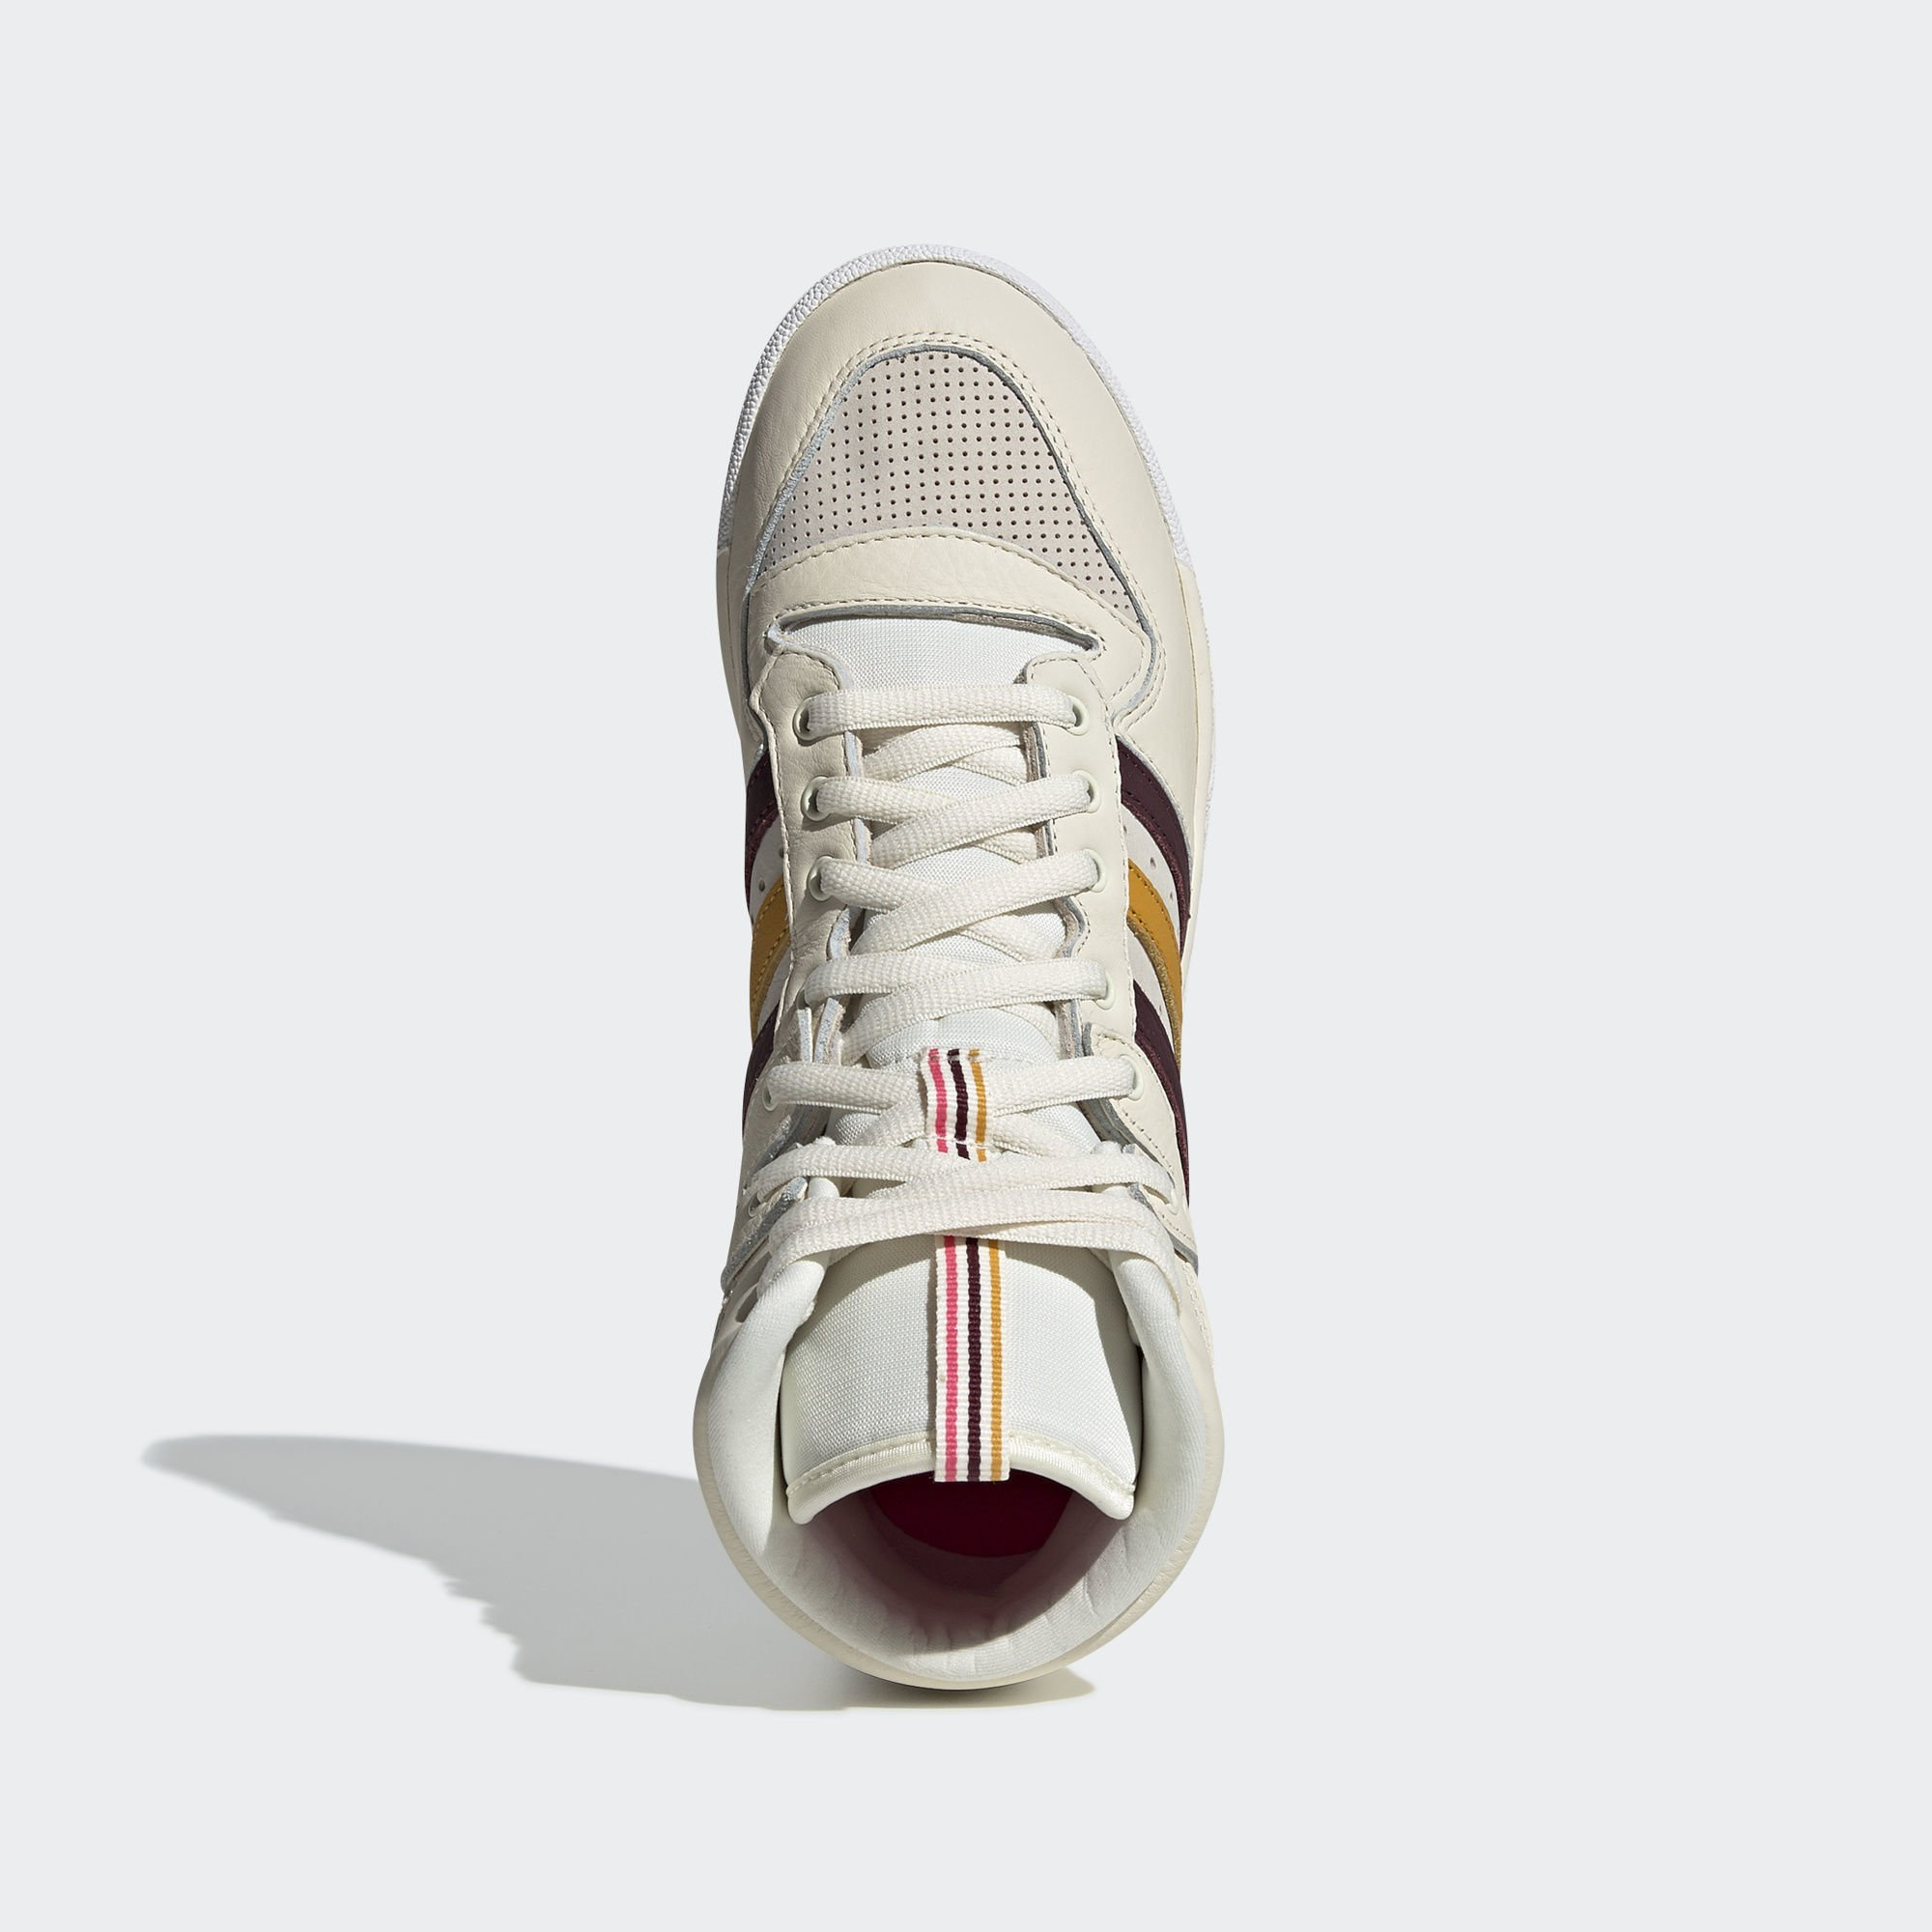 Adidas Eric Emanuel Rivalry Hi OG Cream White / Maroon / Customized (G25836)